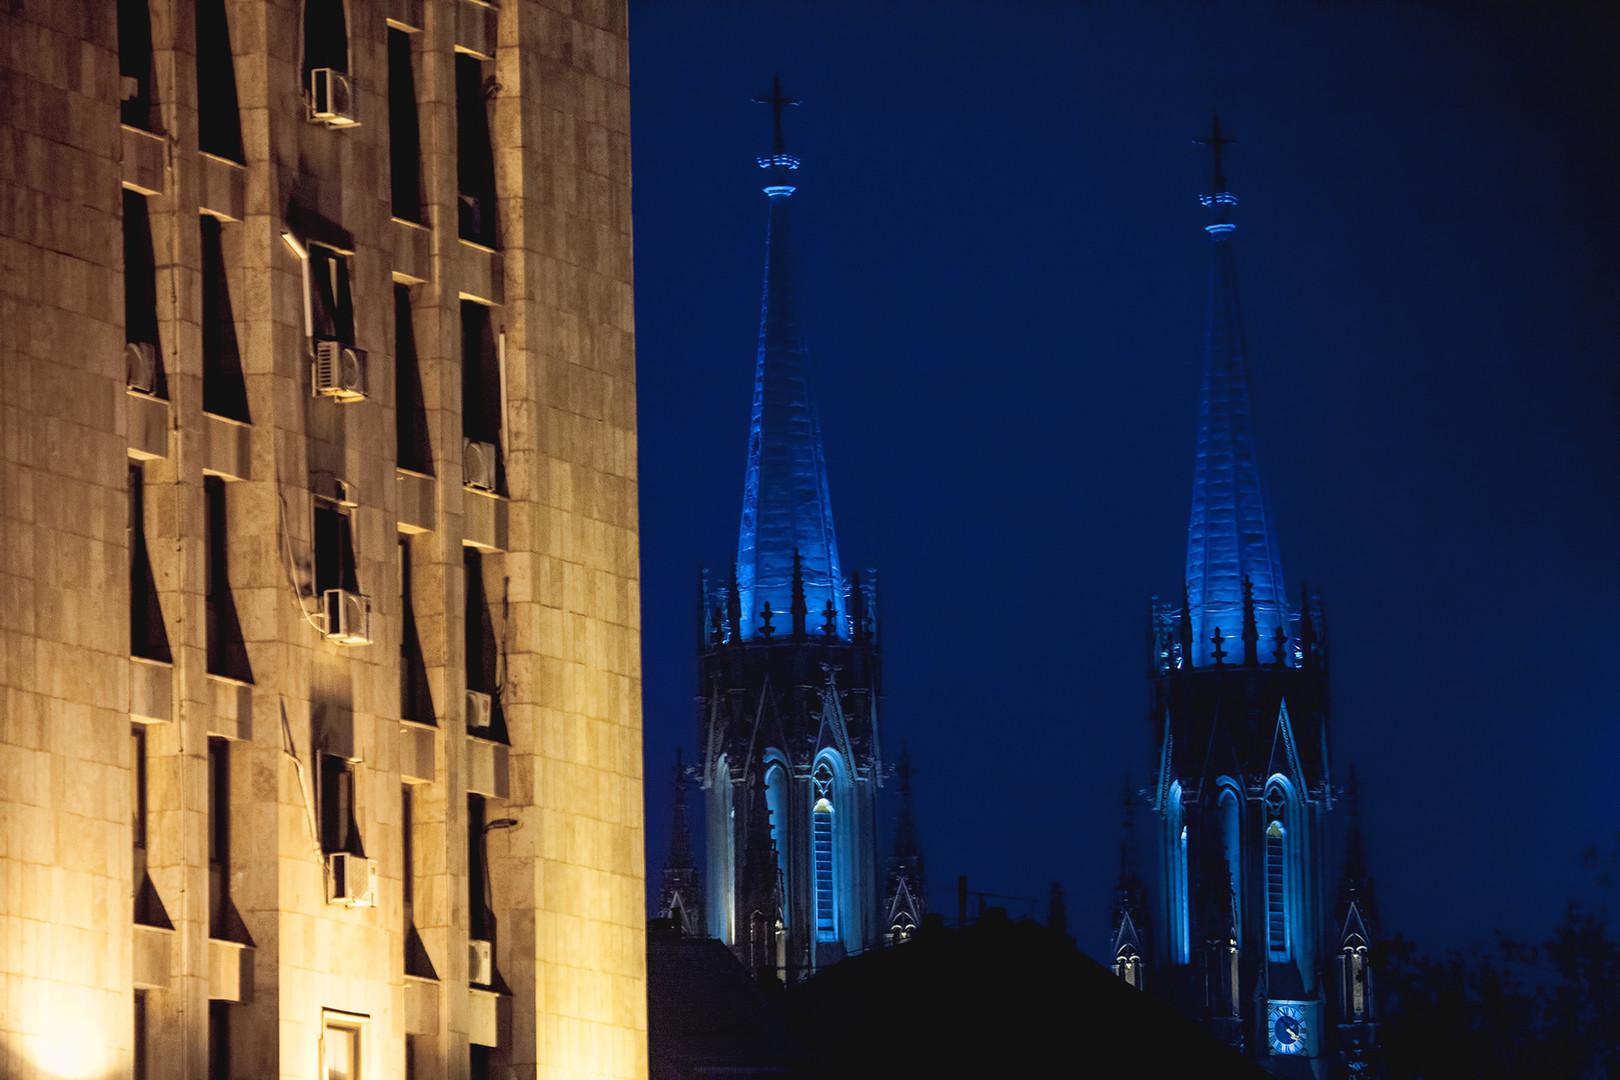 Plava crkva